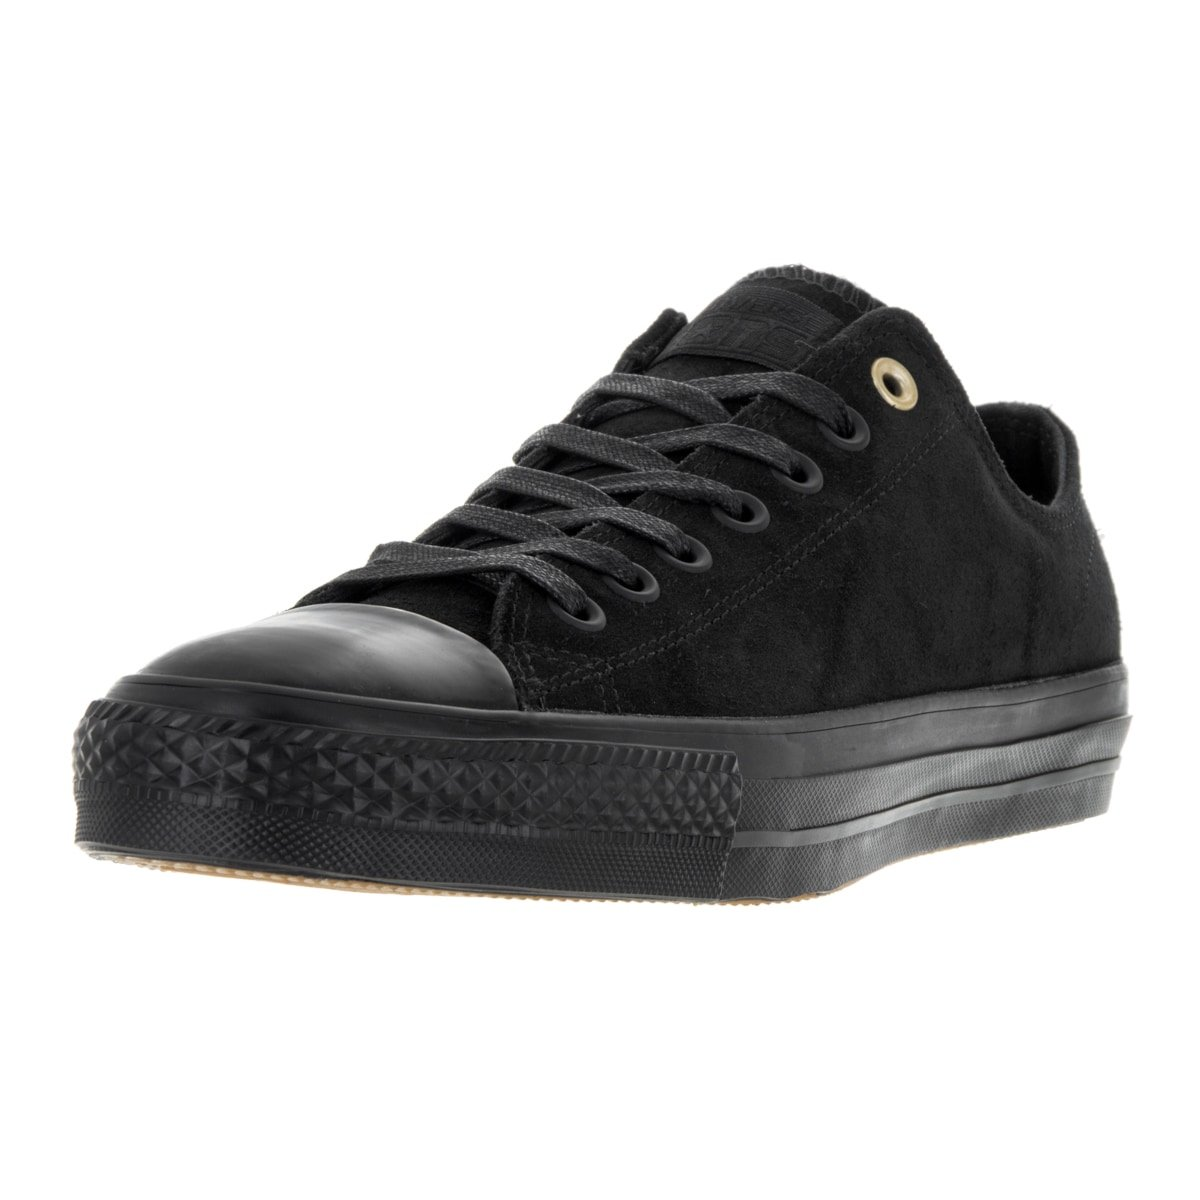 Converse Unisex One Star Pro Ox Black/Black/Storm Wind Skate Shoe 12